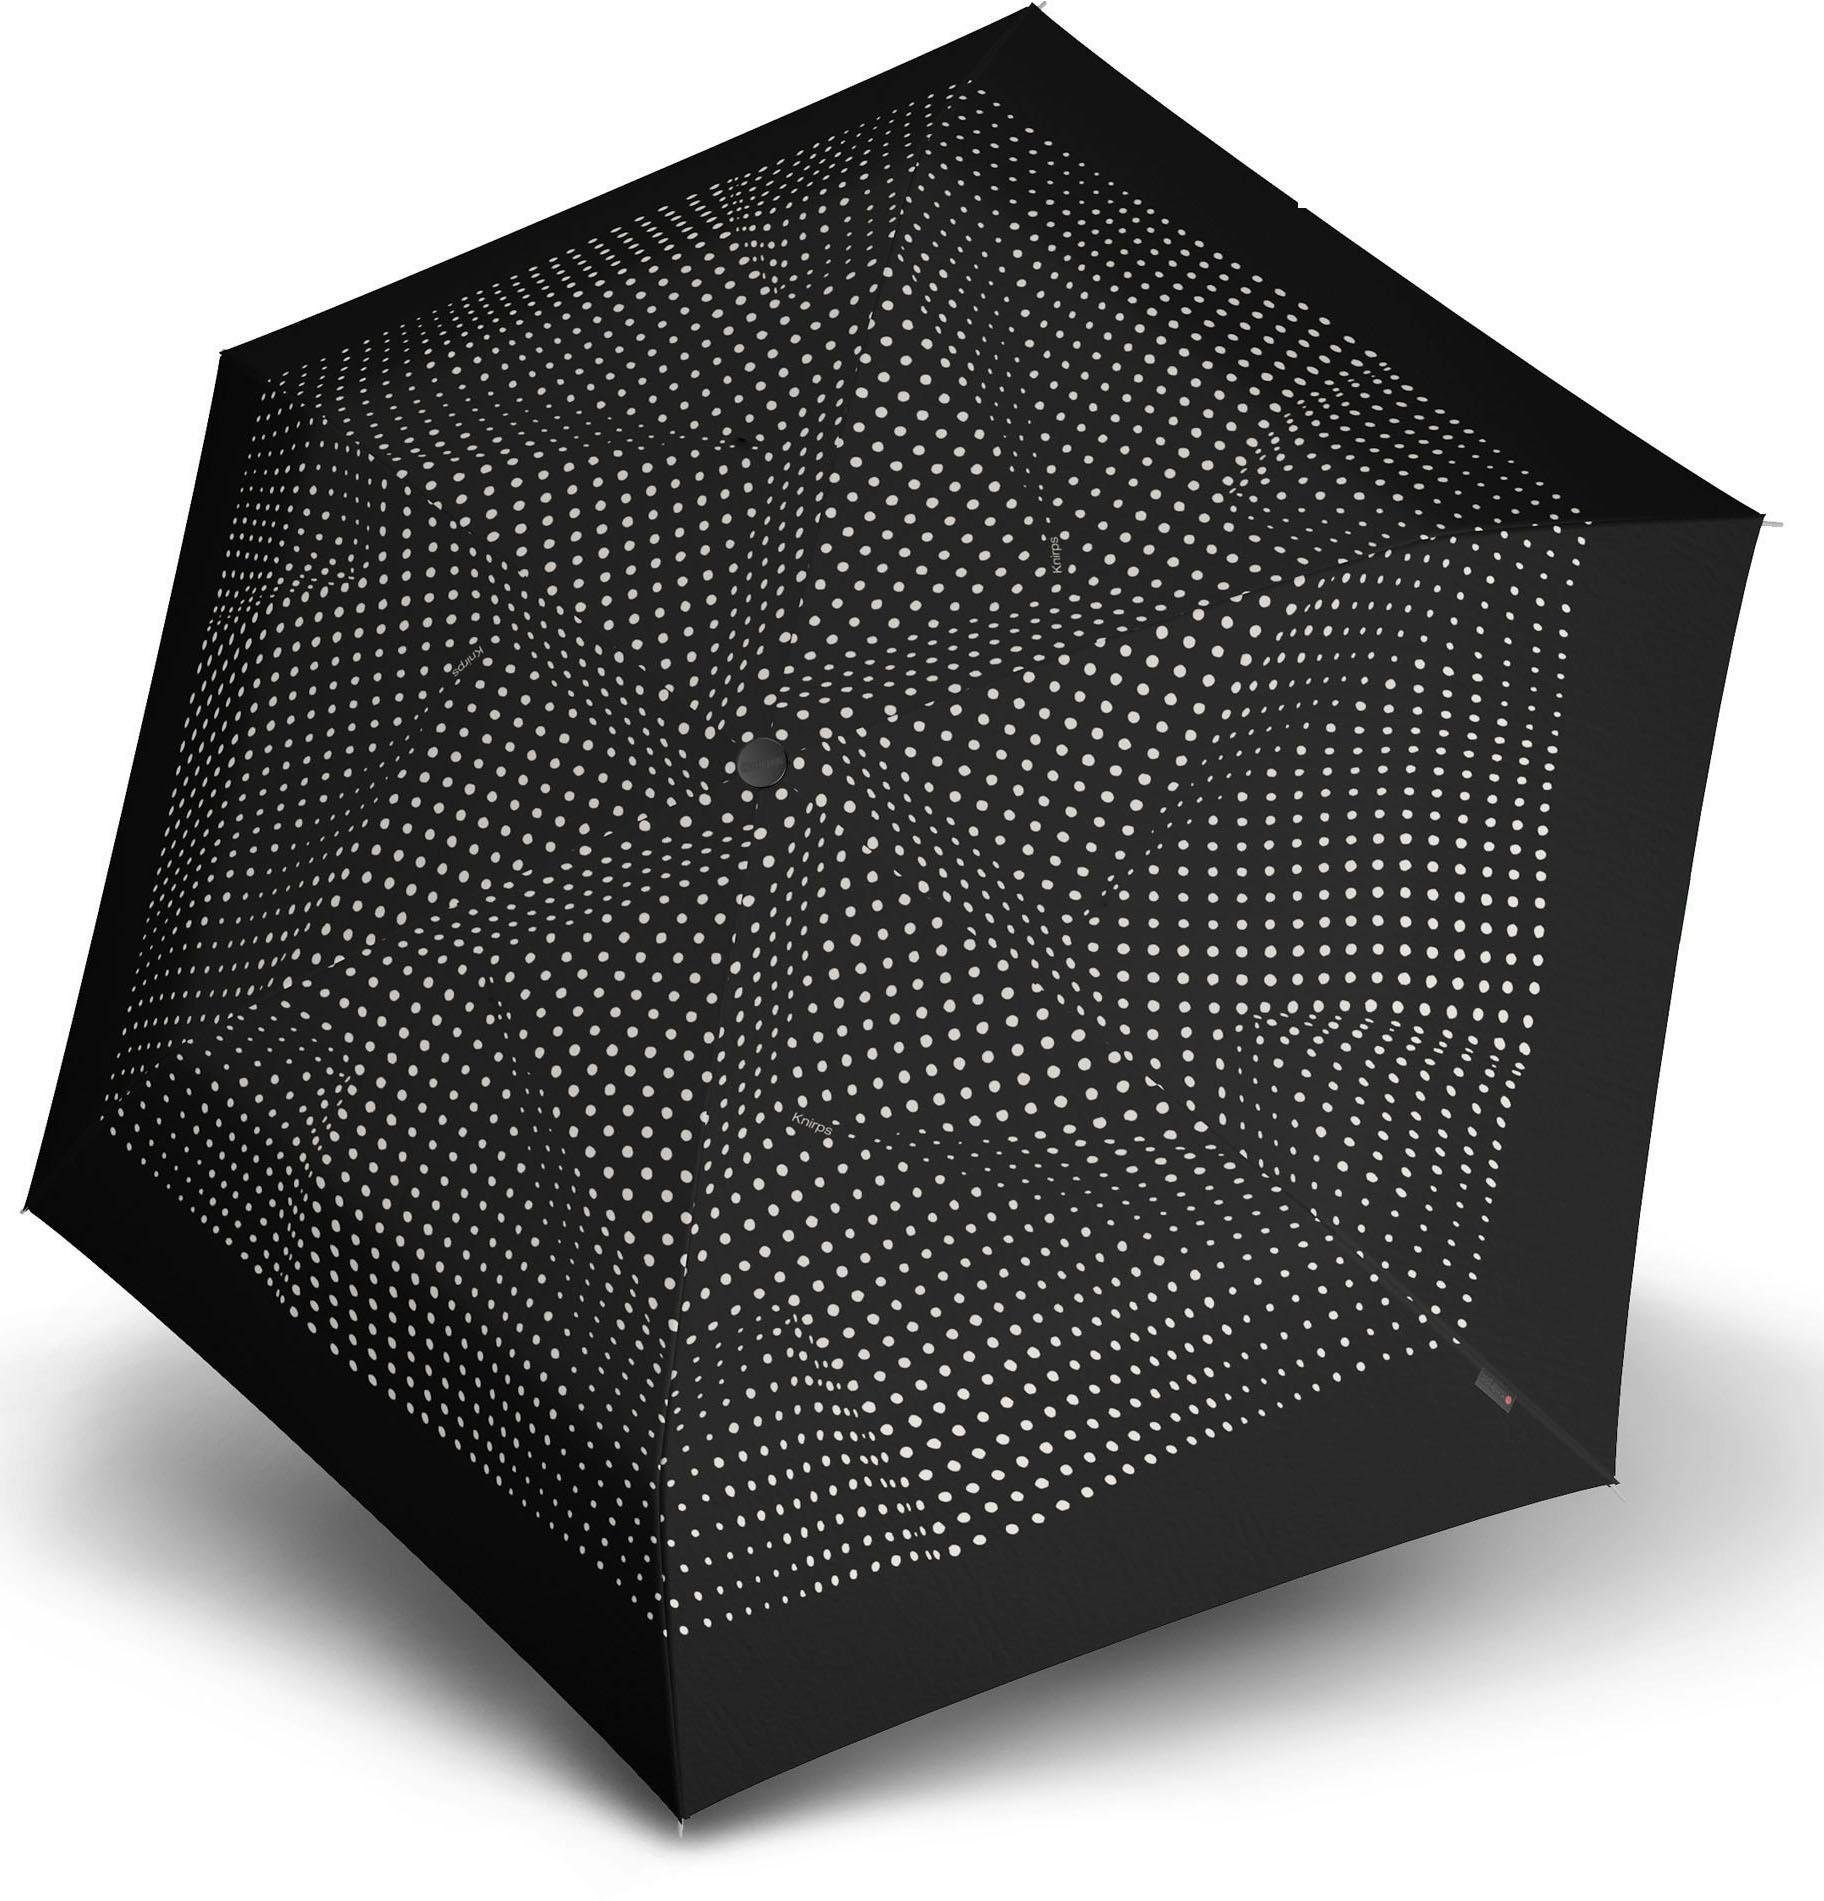 Knirps® Regenschirm - Taschenschirm, »TS.200 Slim Medium Duomatic bolero black/ecru«